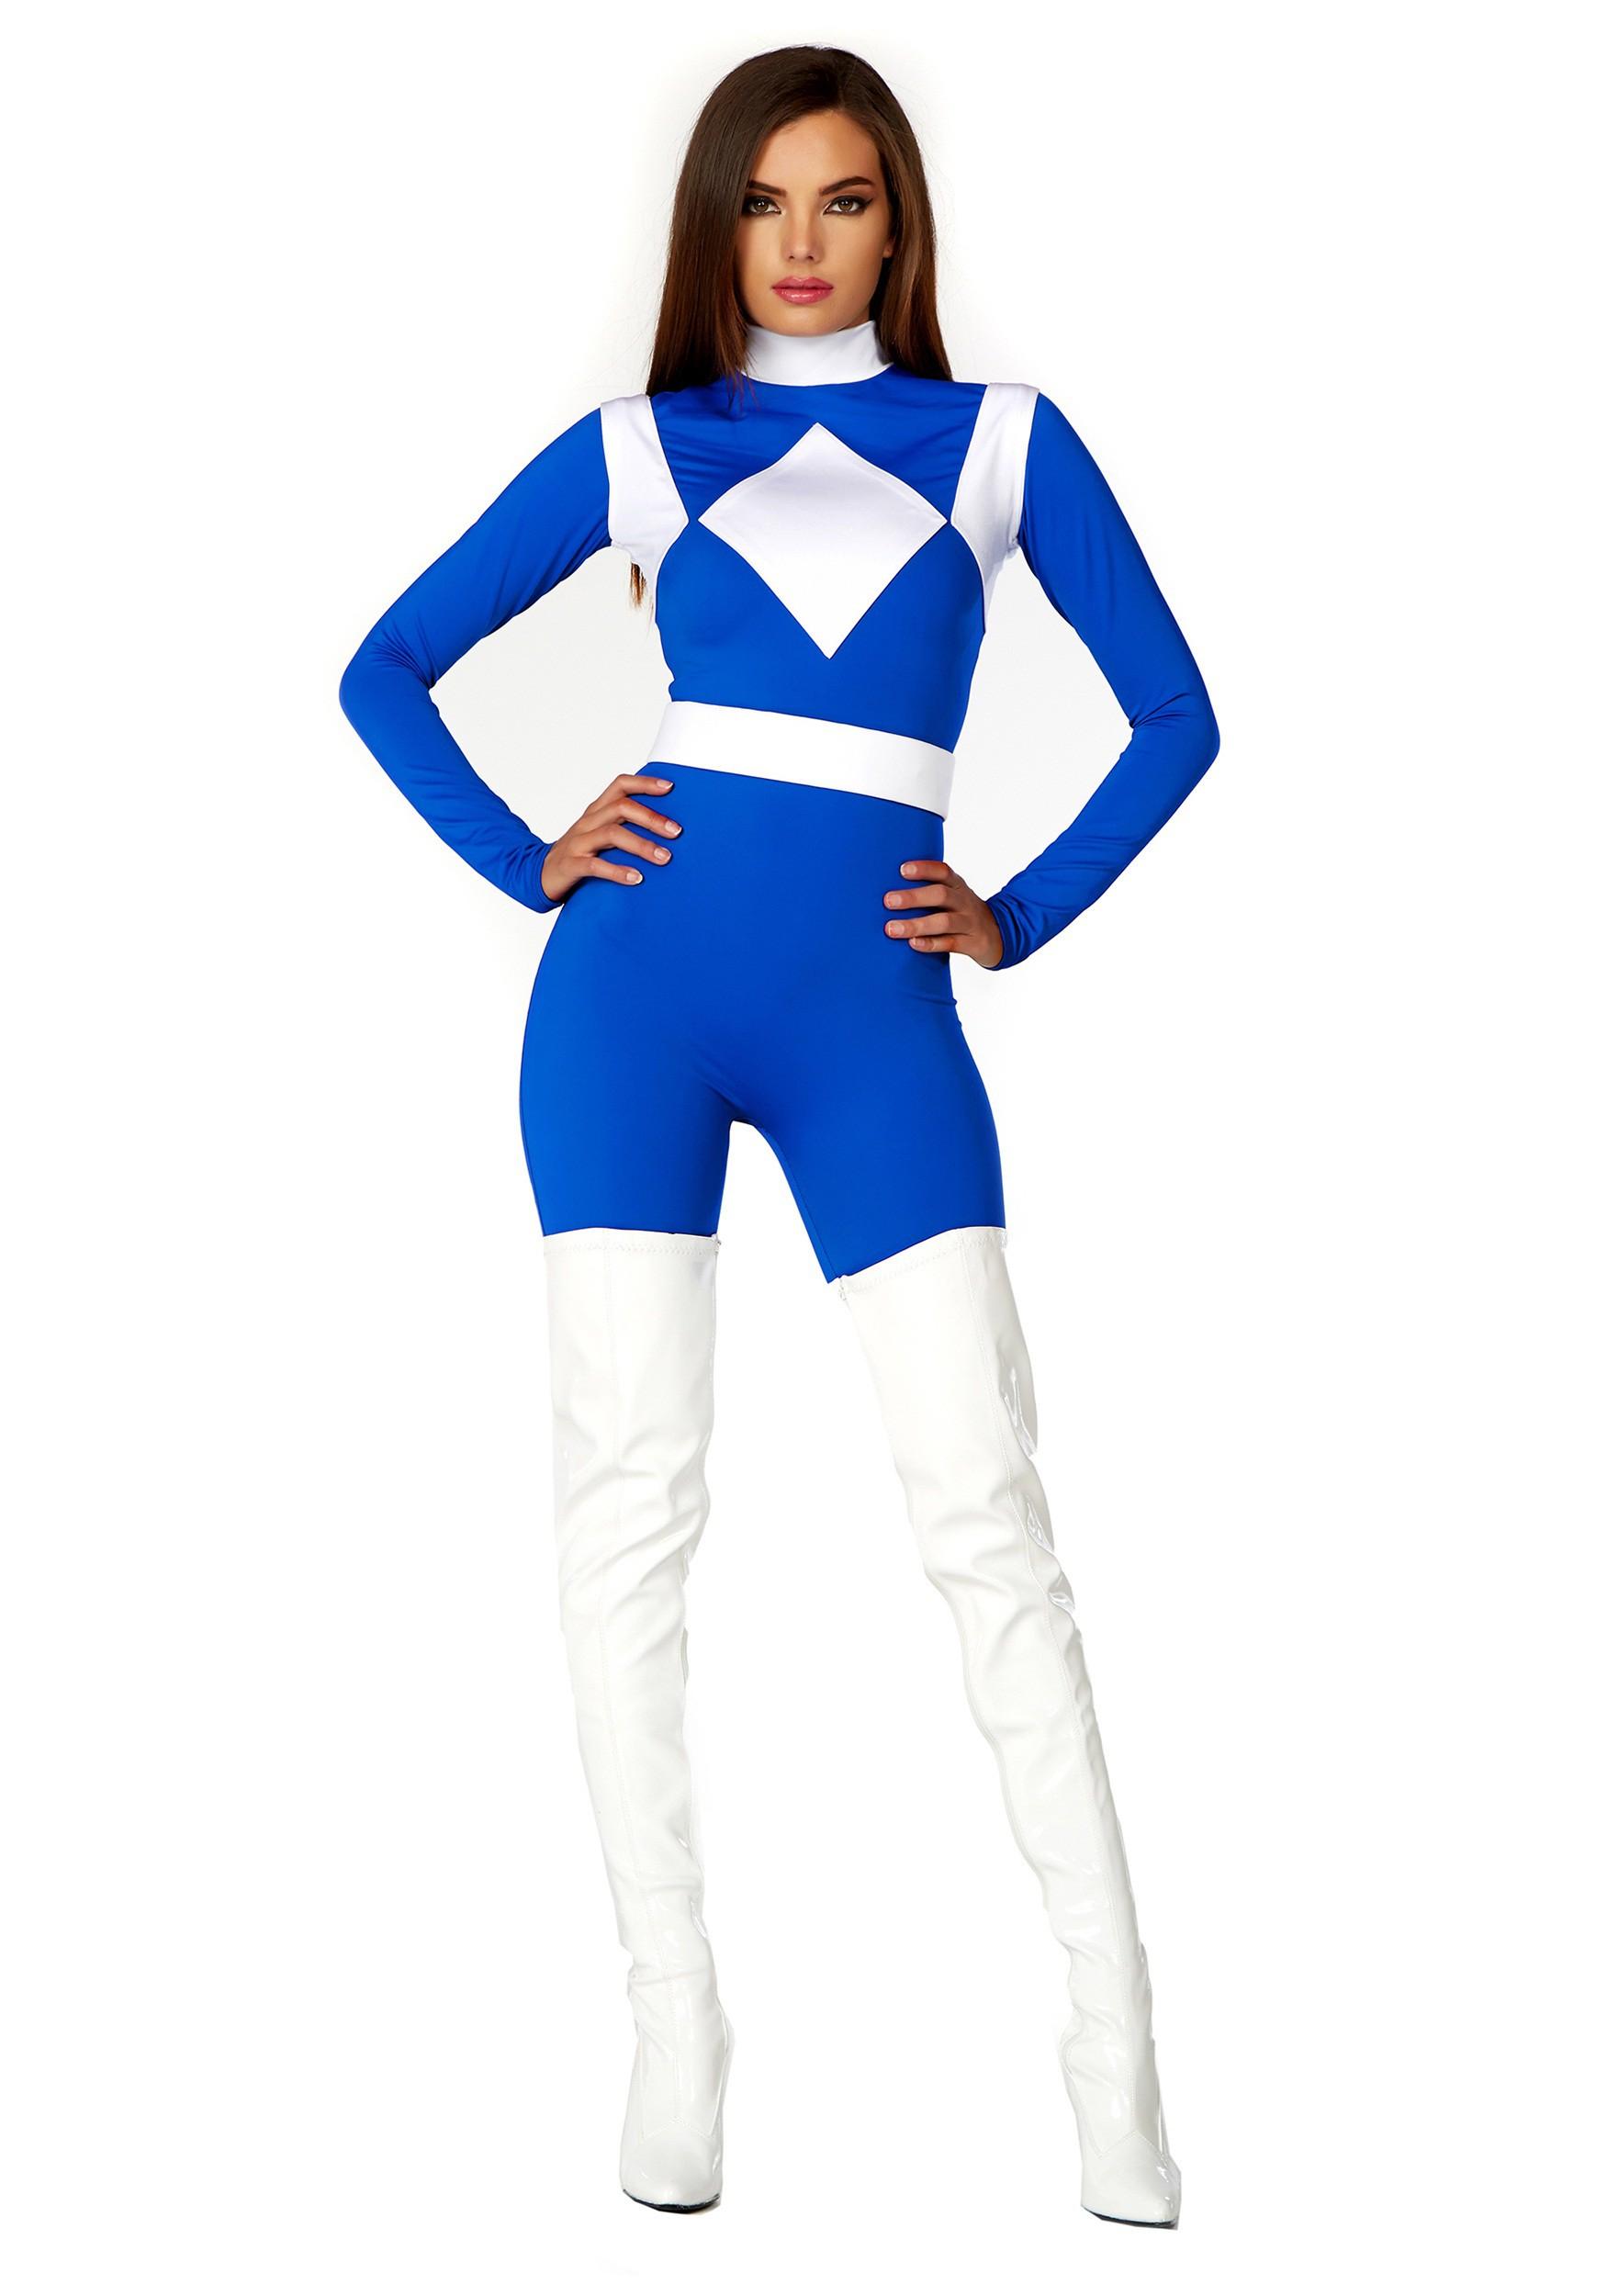 Women S Dominance Action Figure Blue Catsuit Costume